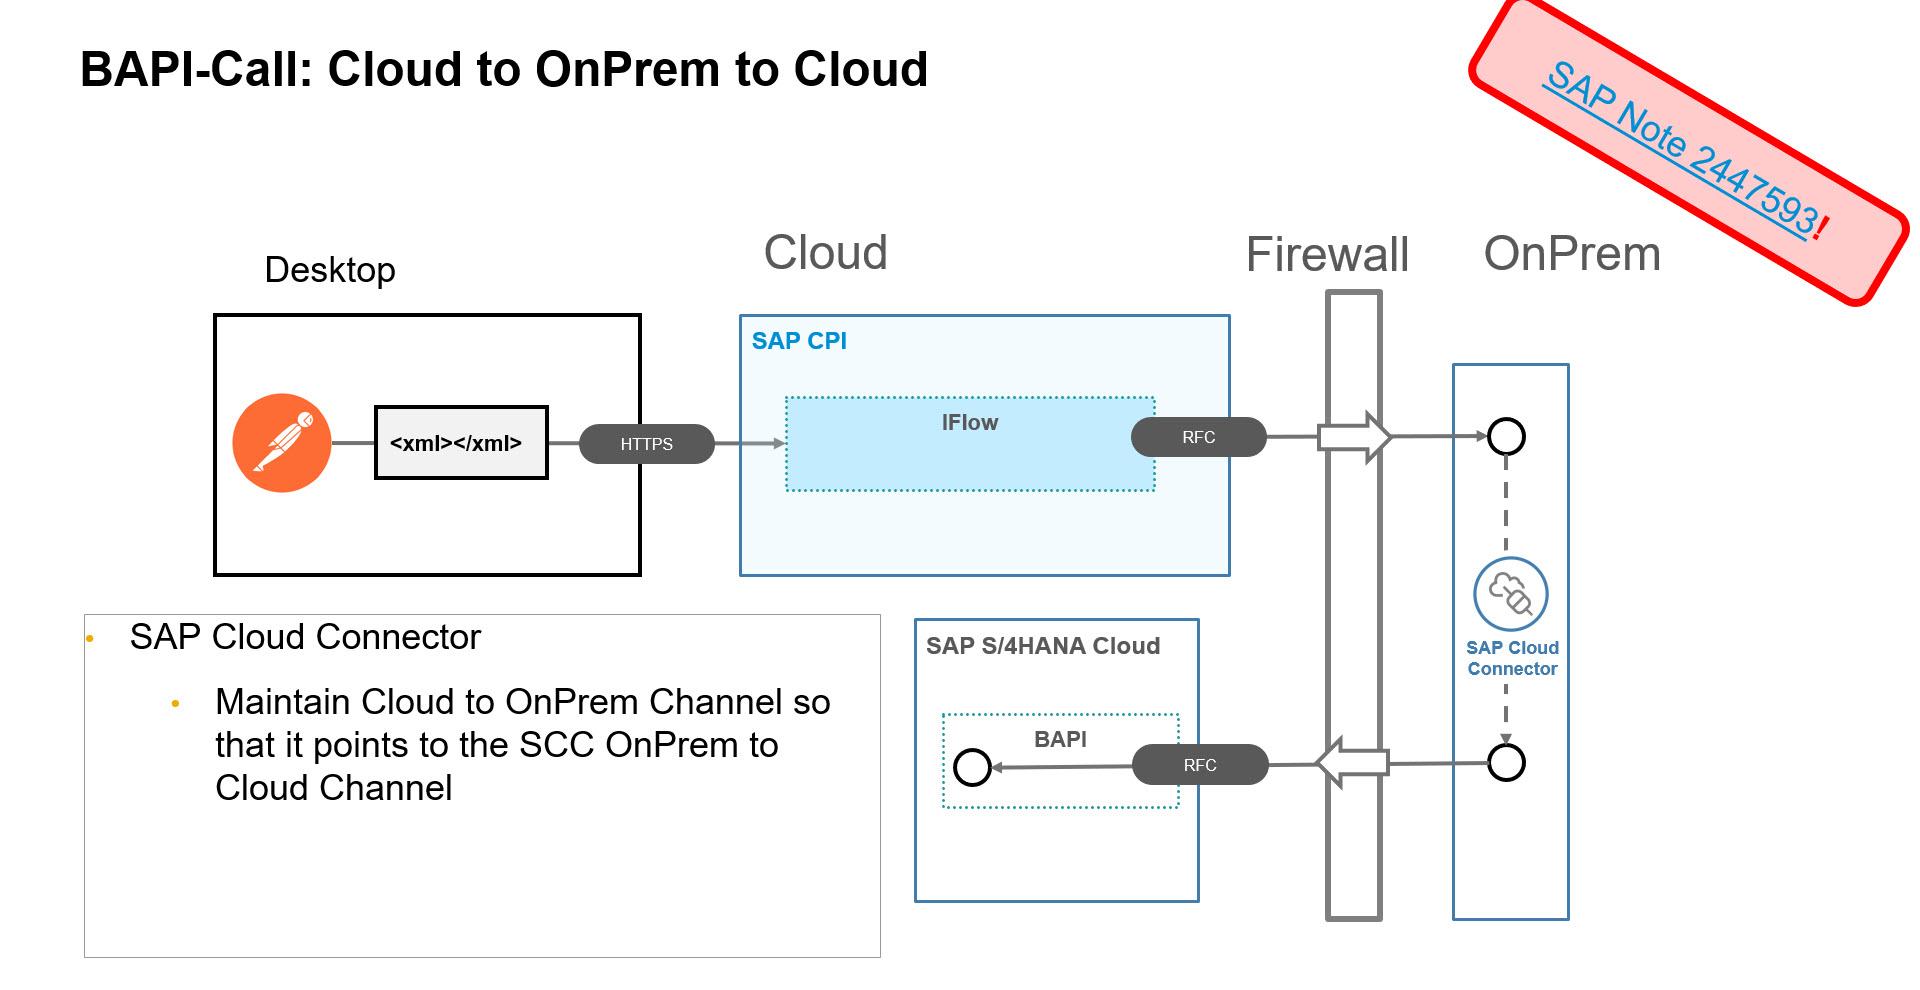 Calling a BAPI in the SAP S/4HANA Cloud from the Cloud   SAP